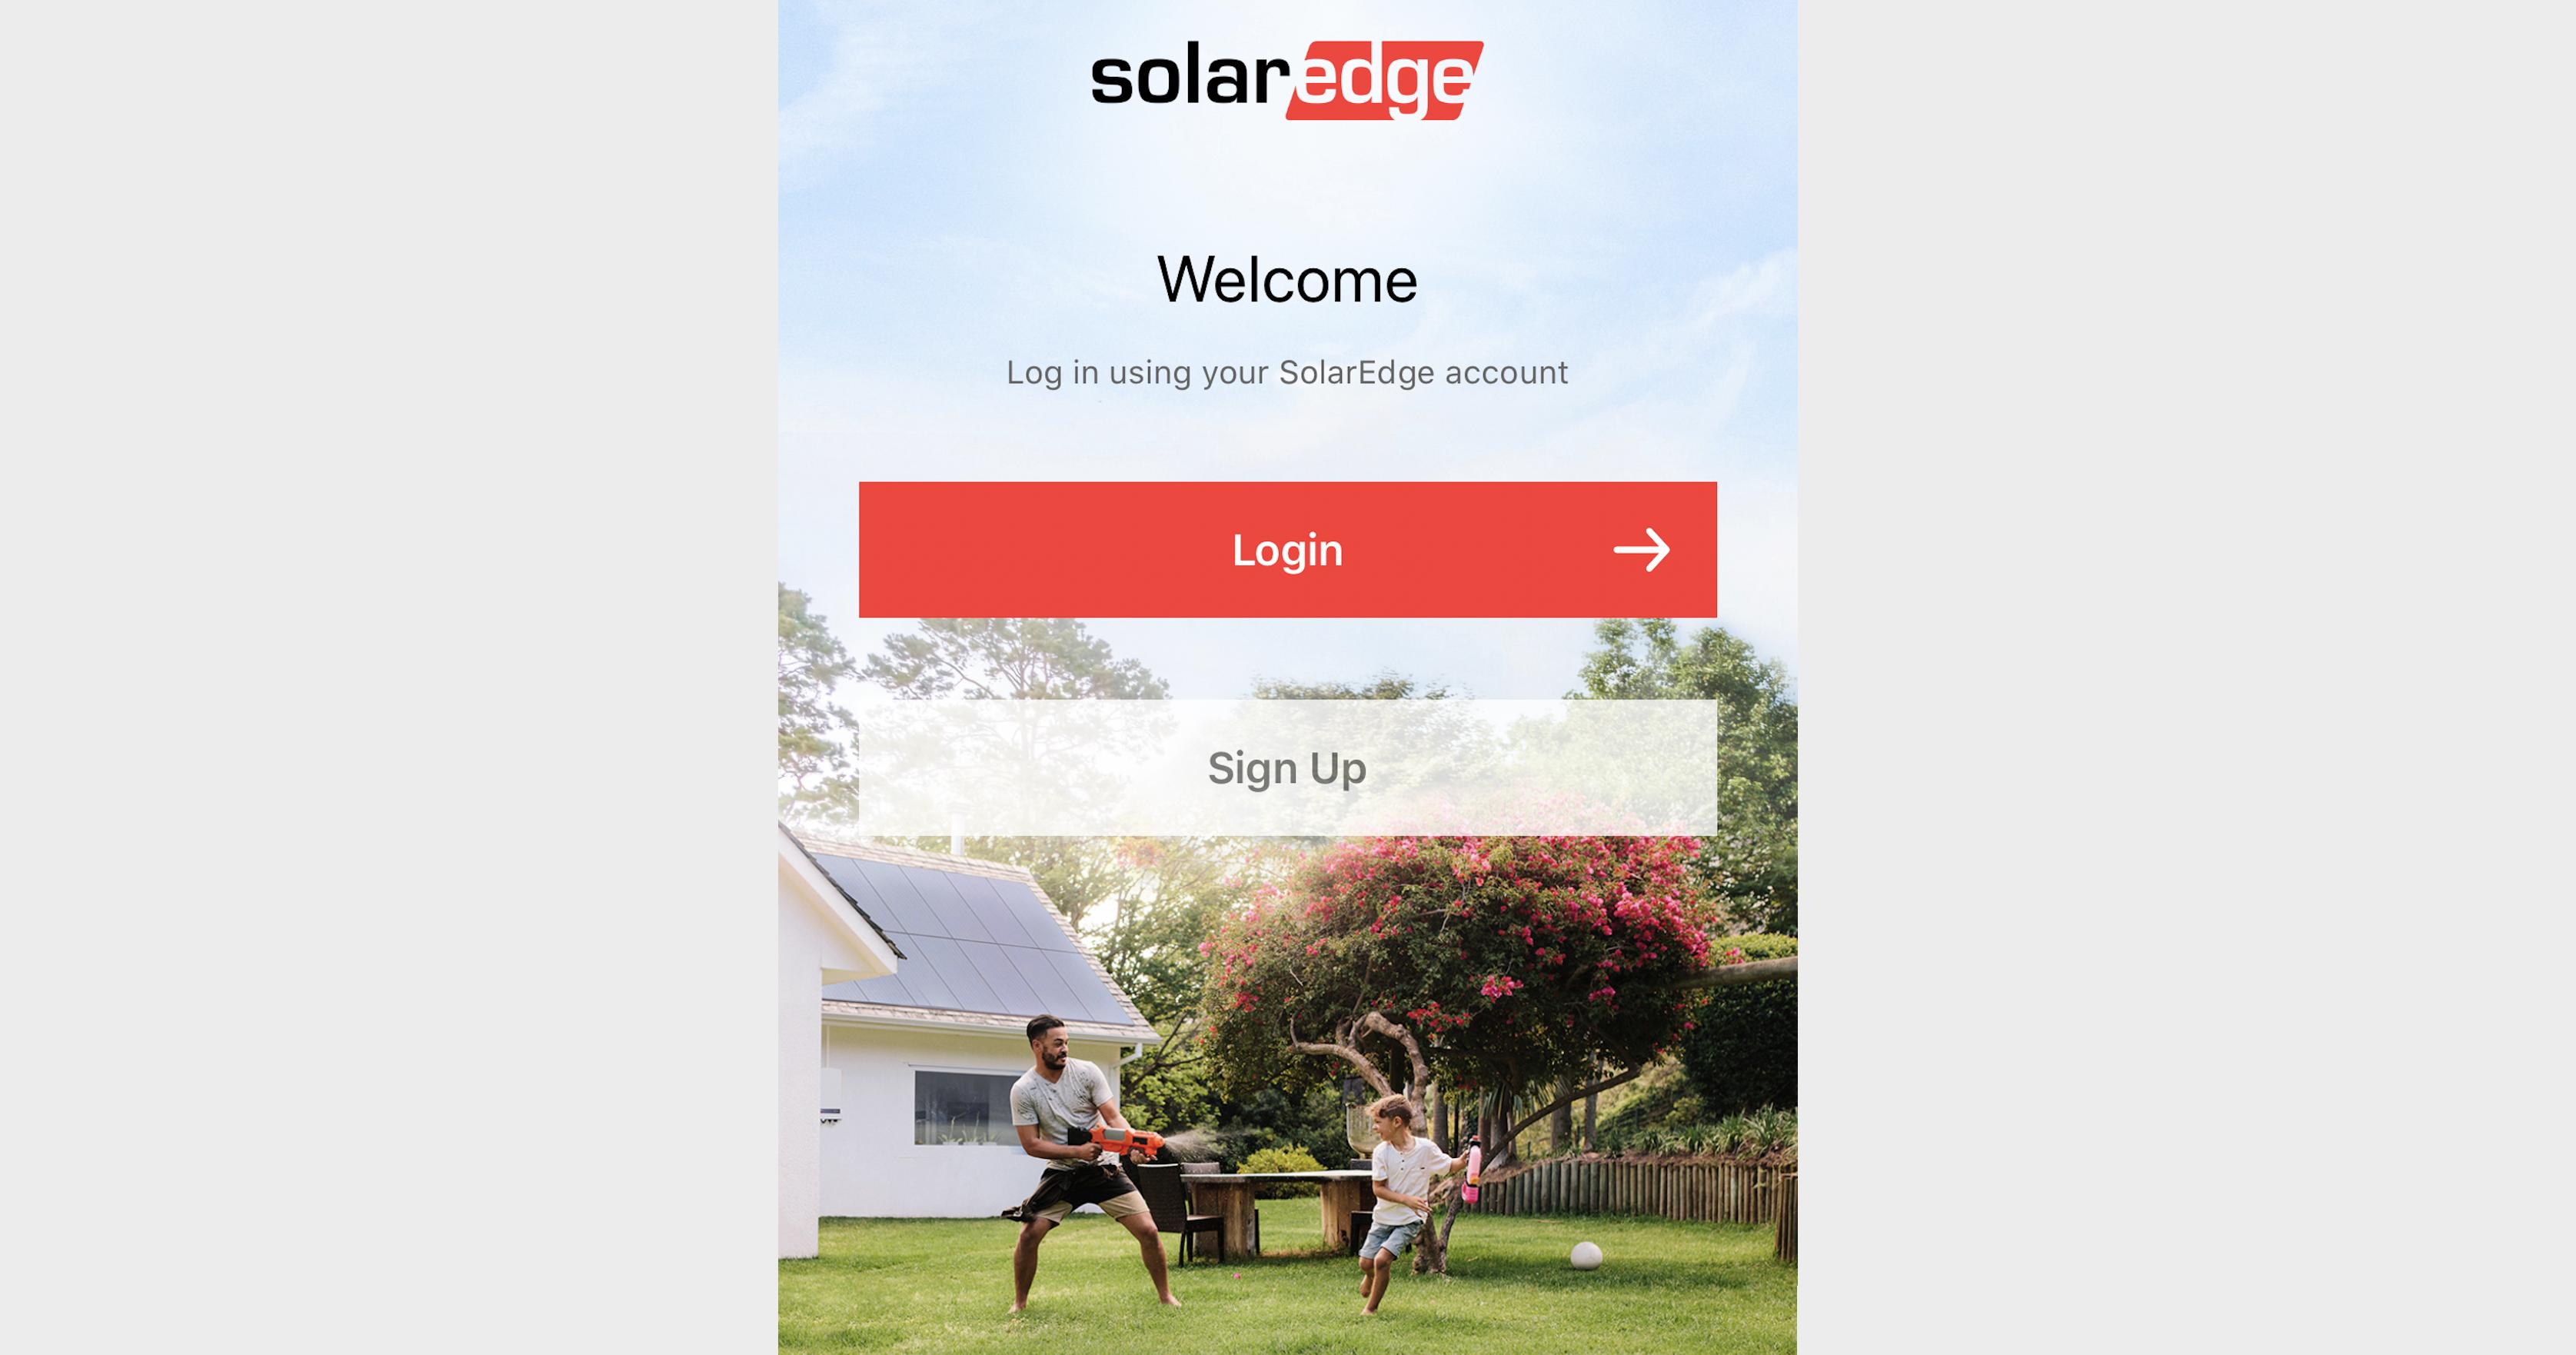 Ny app fra SolarEdge